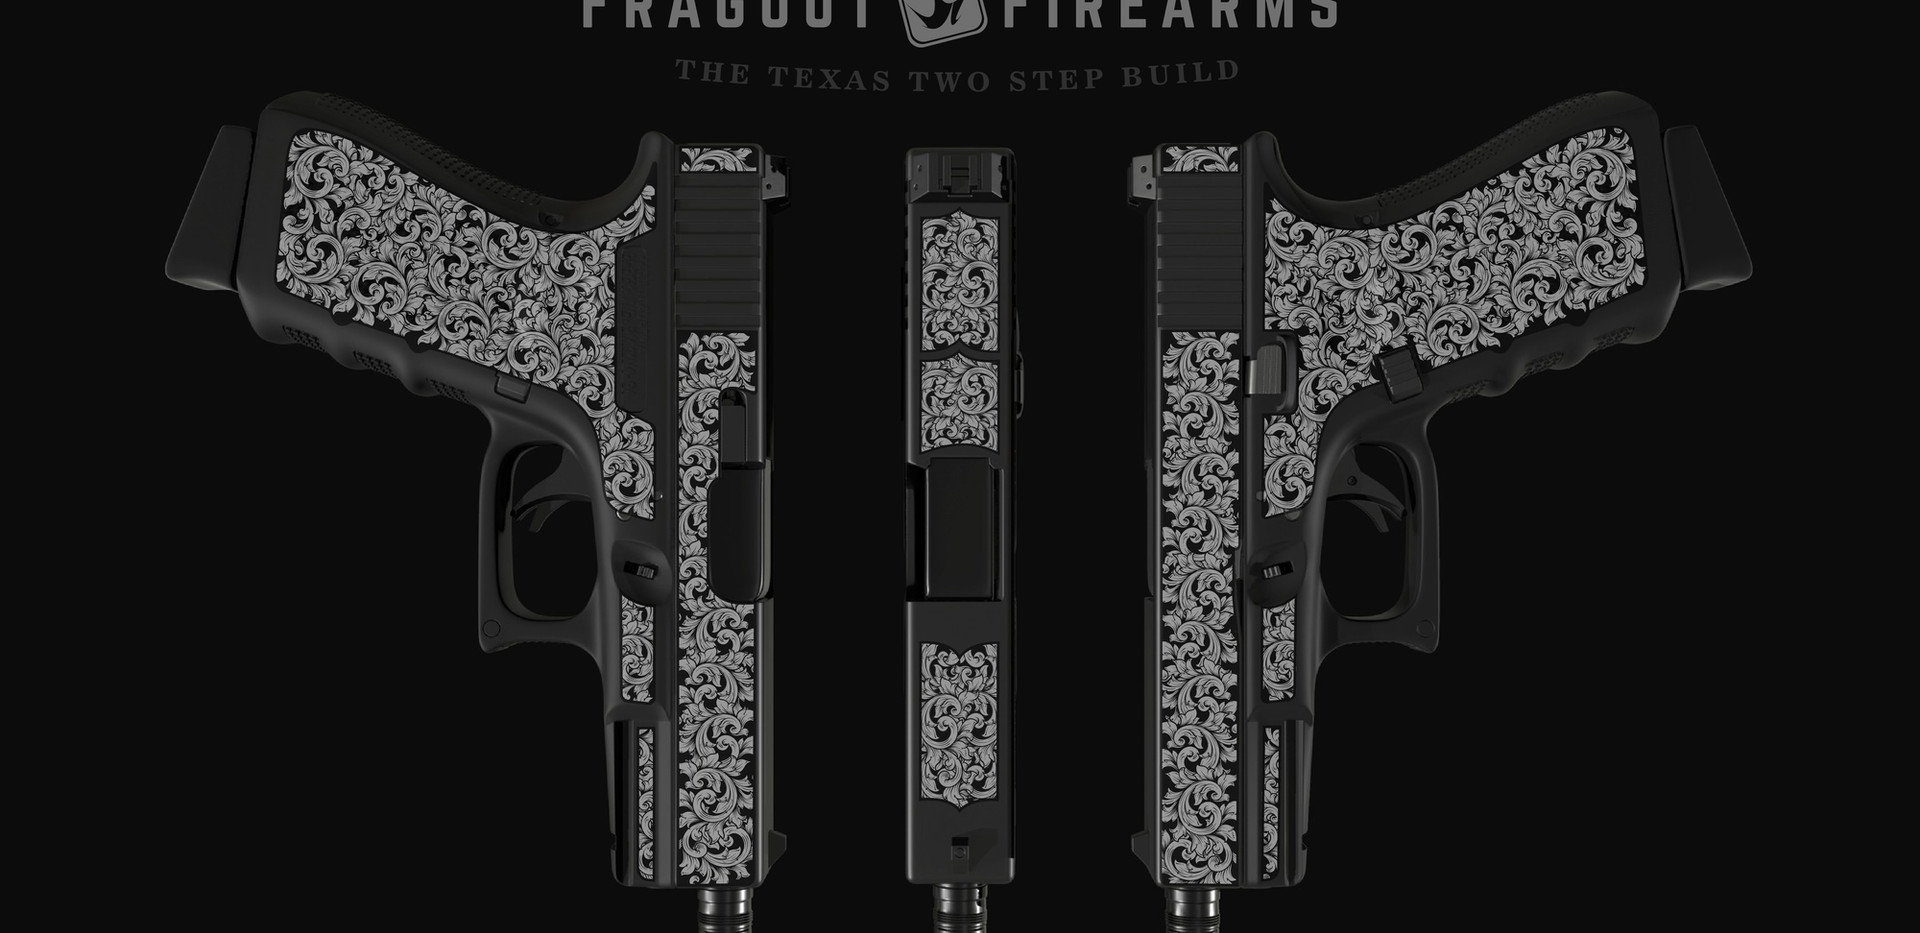 Fragout Firearms Laser Engraving Build